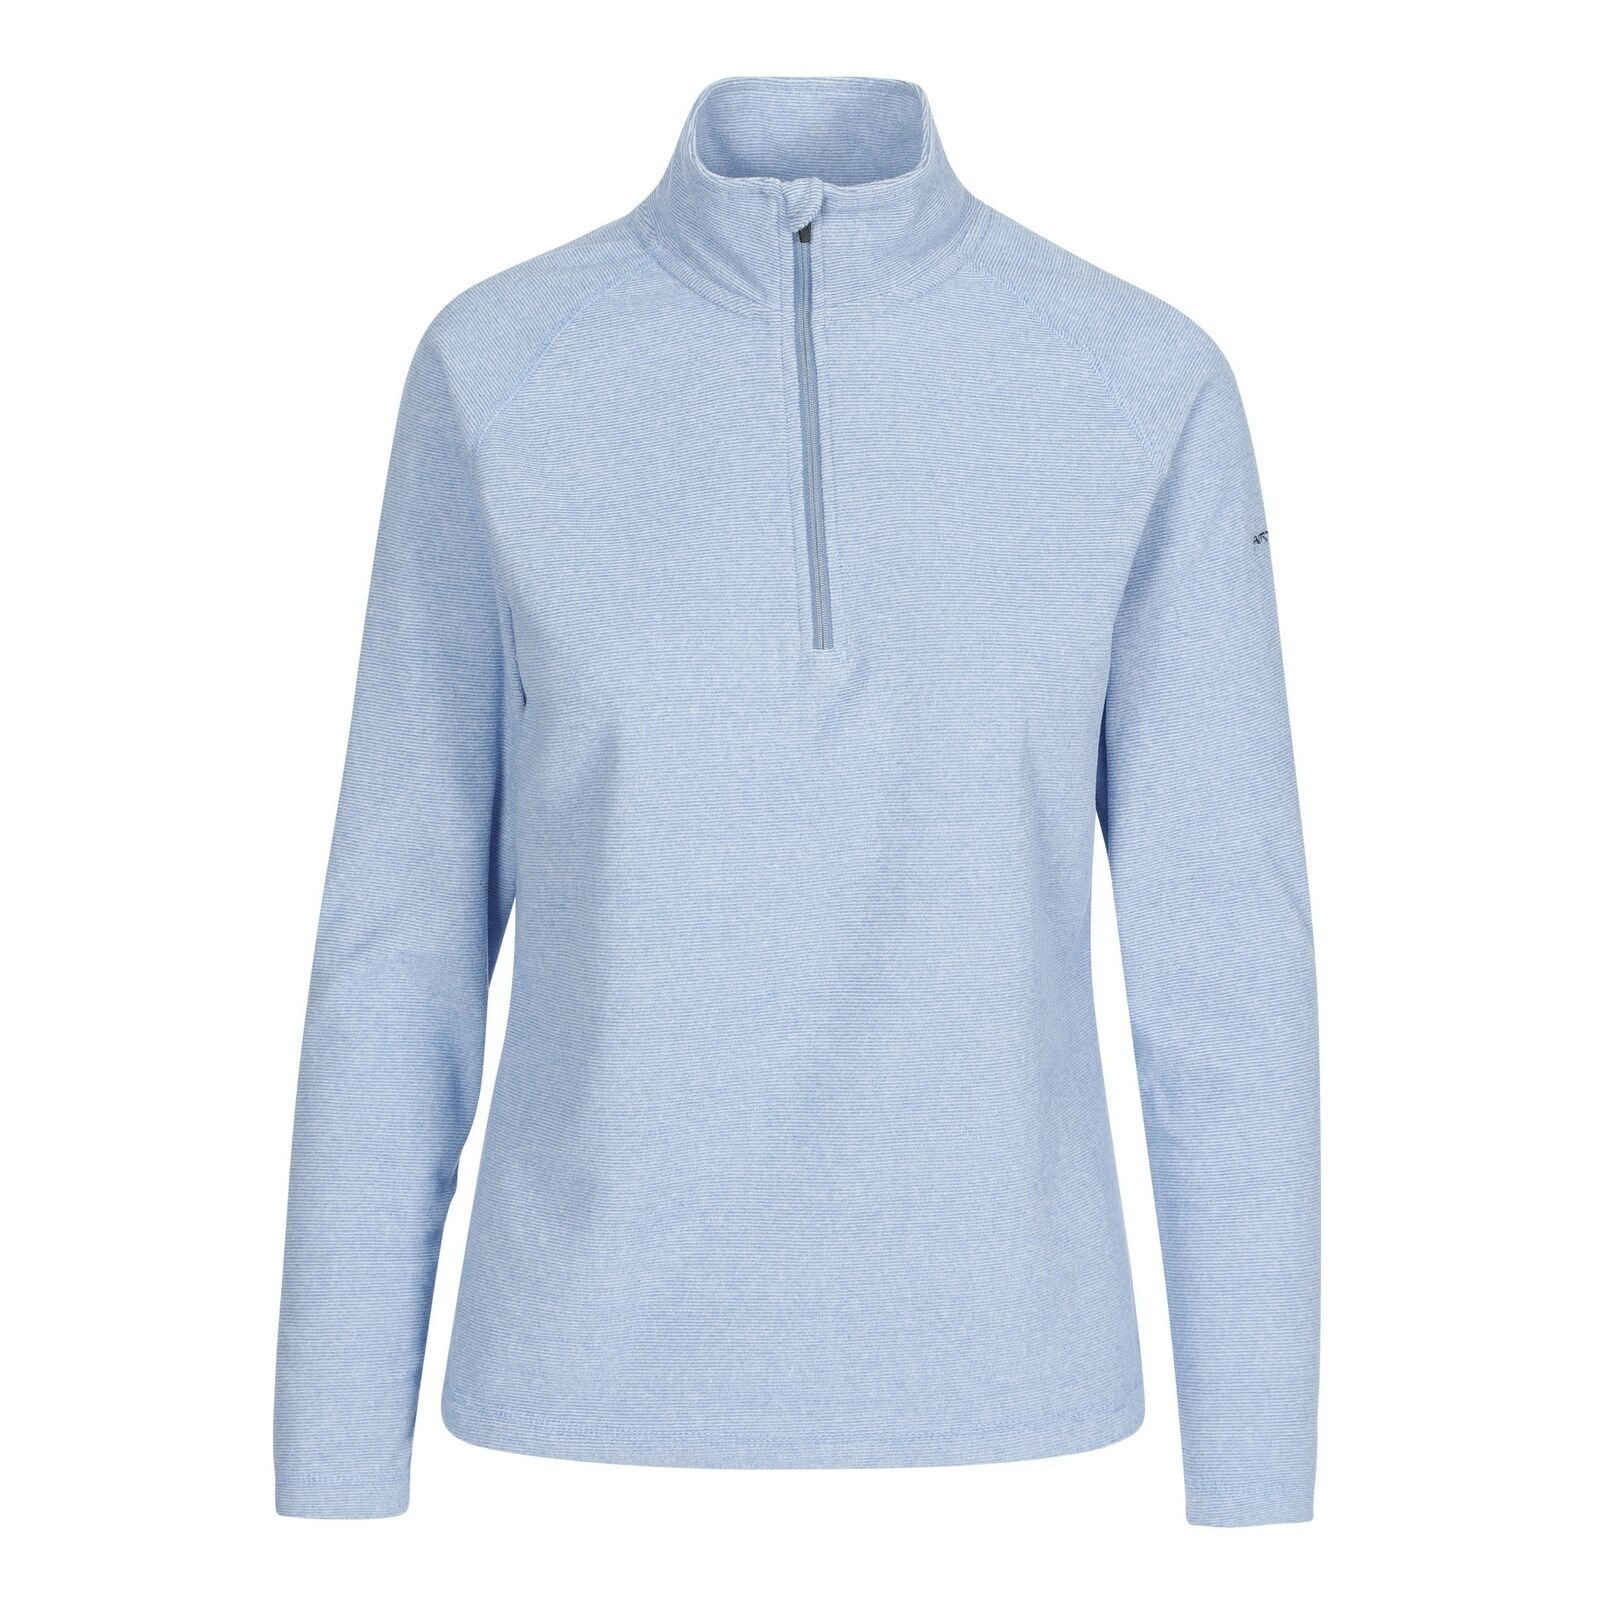 Trespass Womens/Ladies Meadows Fleece Top (Denim Blue)